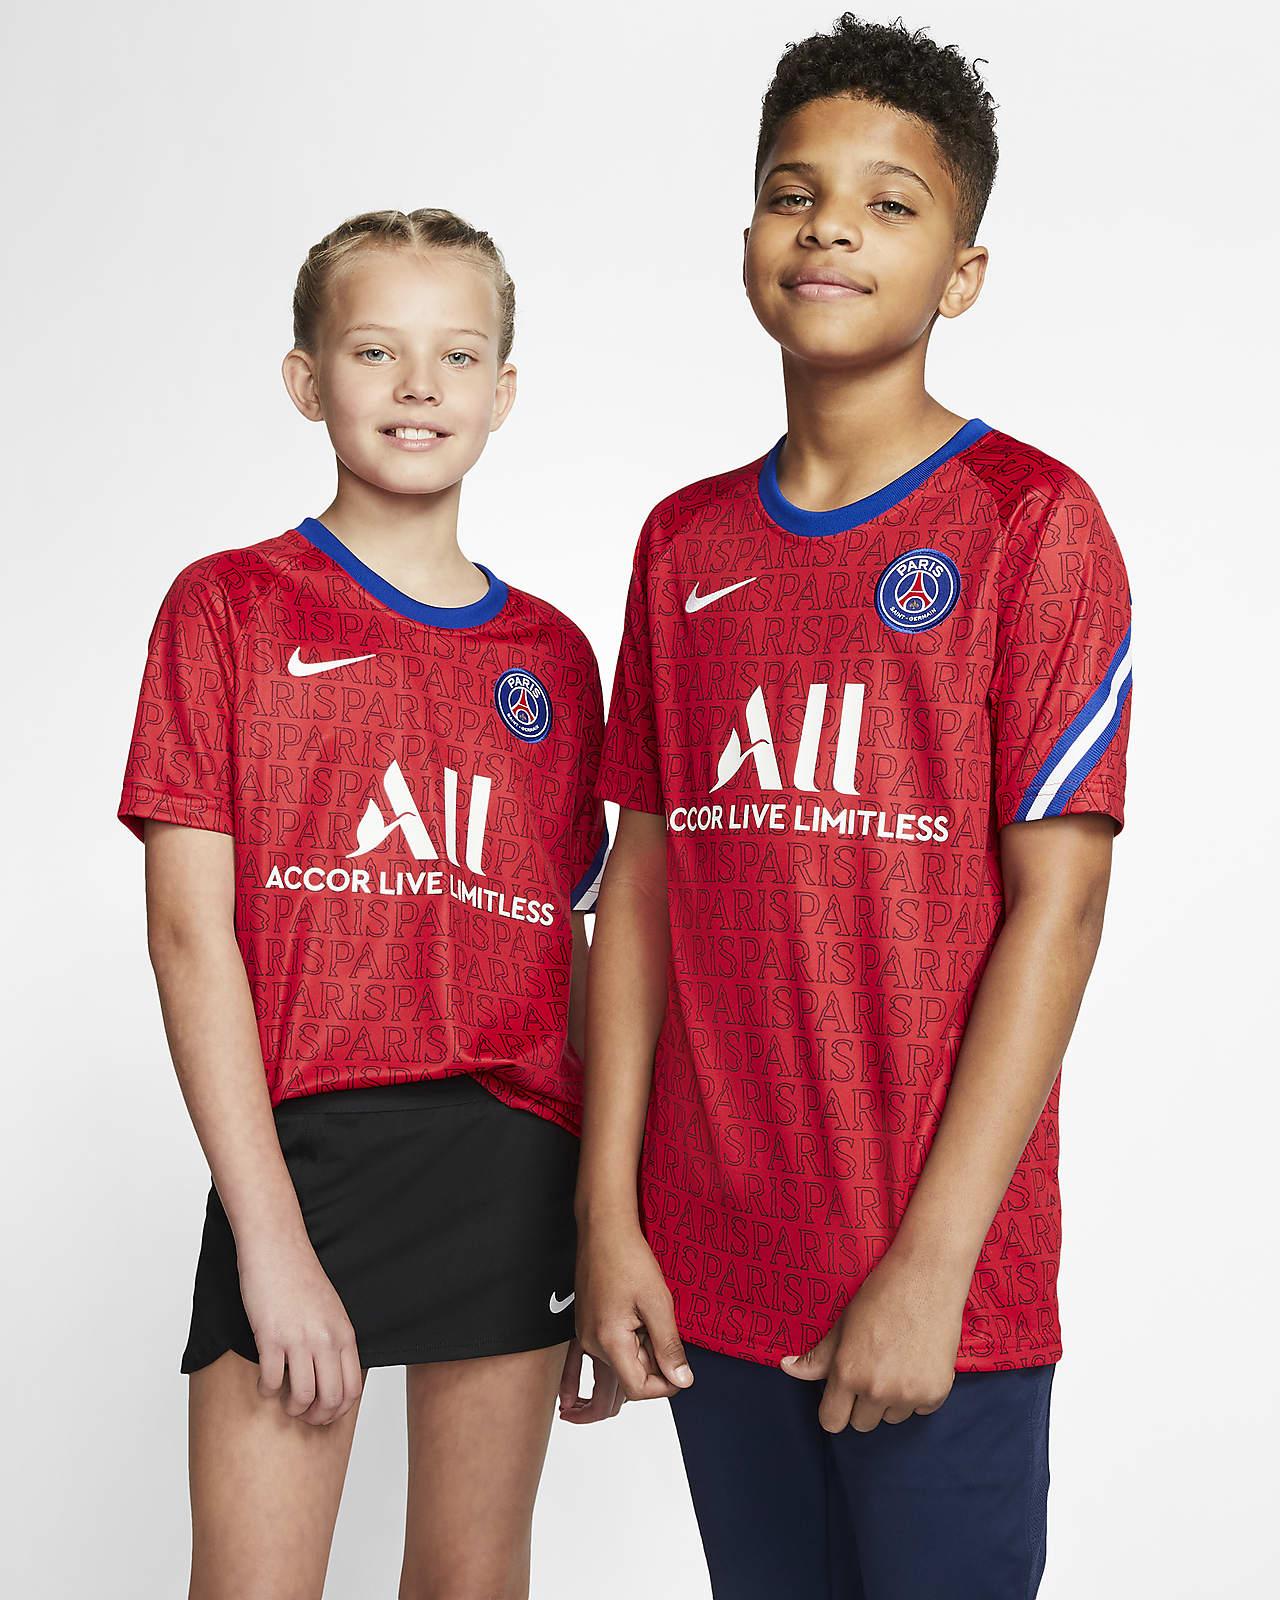 Paris Saint-Germain Big Kids' Short-Sleeve Soccer Top